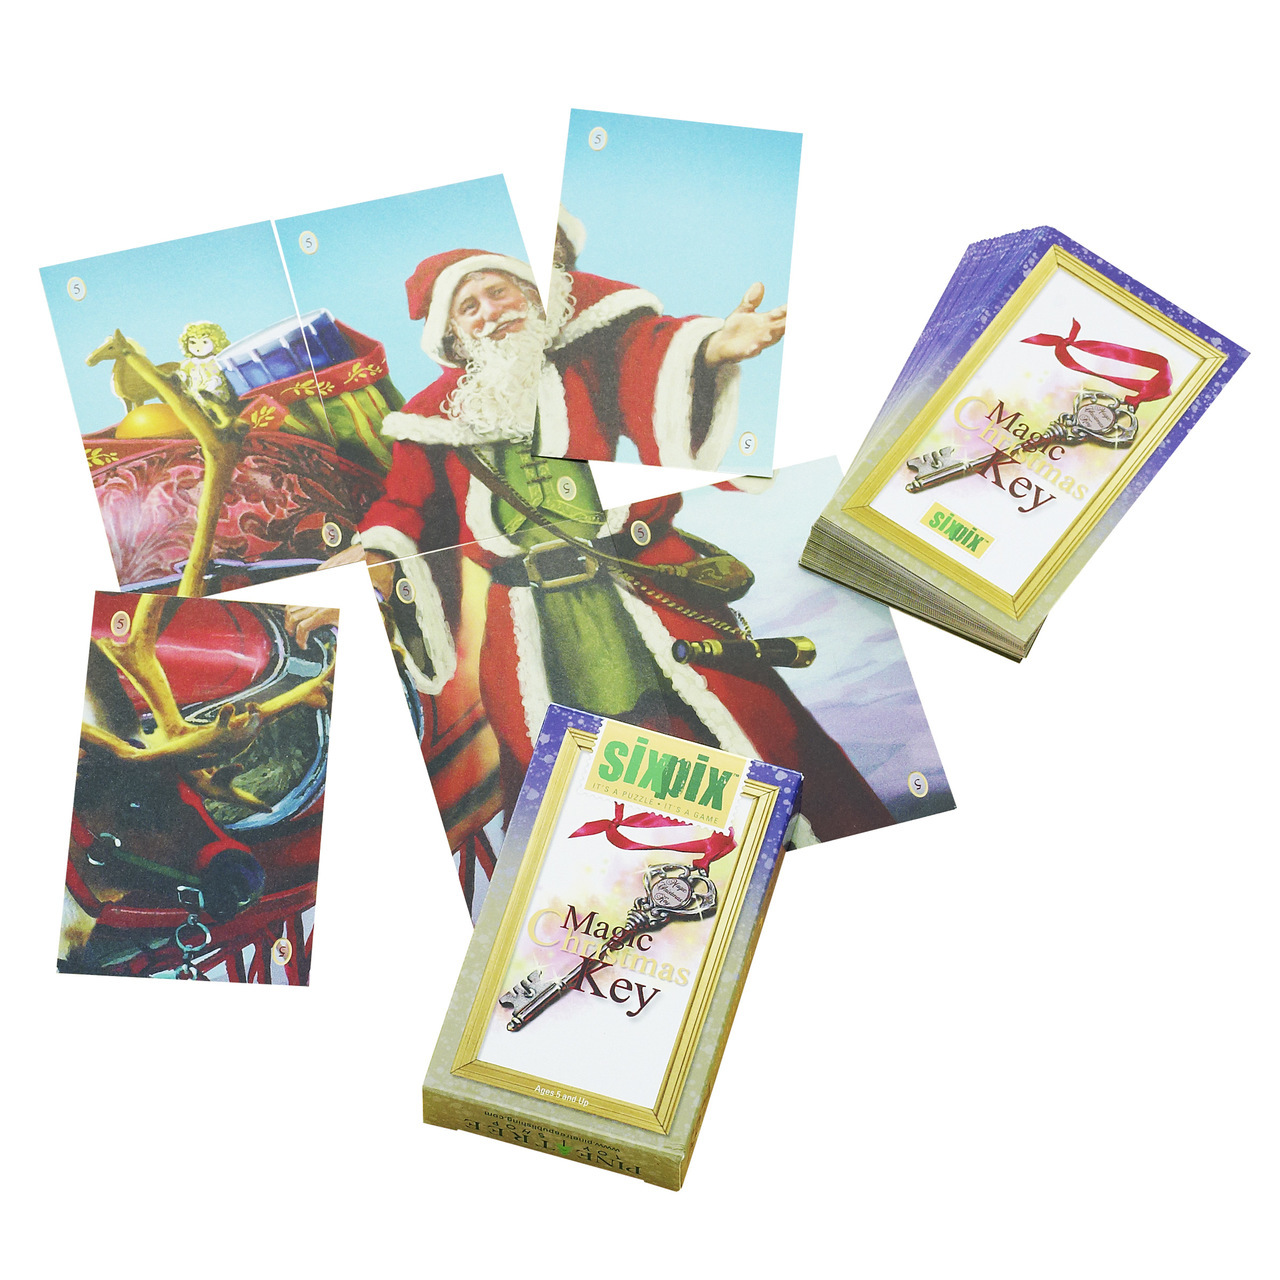 Christmas gacme stocking stuffer magic key six pix cards wendell magic key six pixcards m4hsunfo